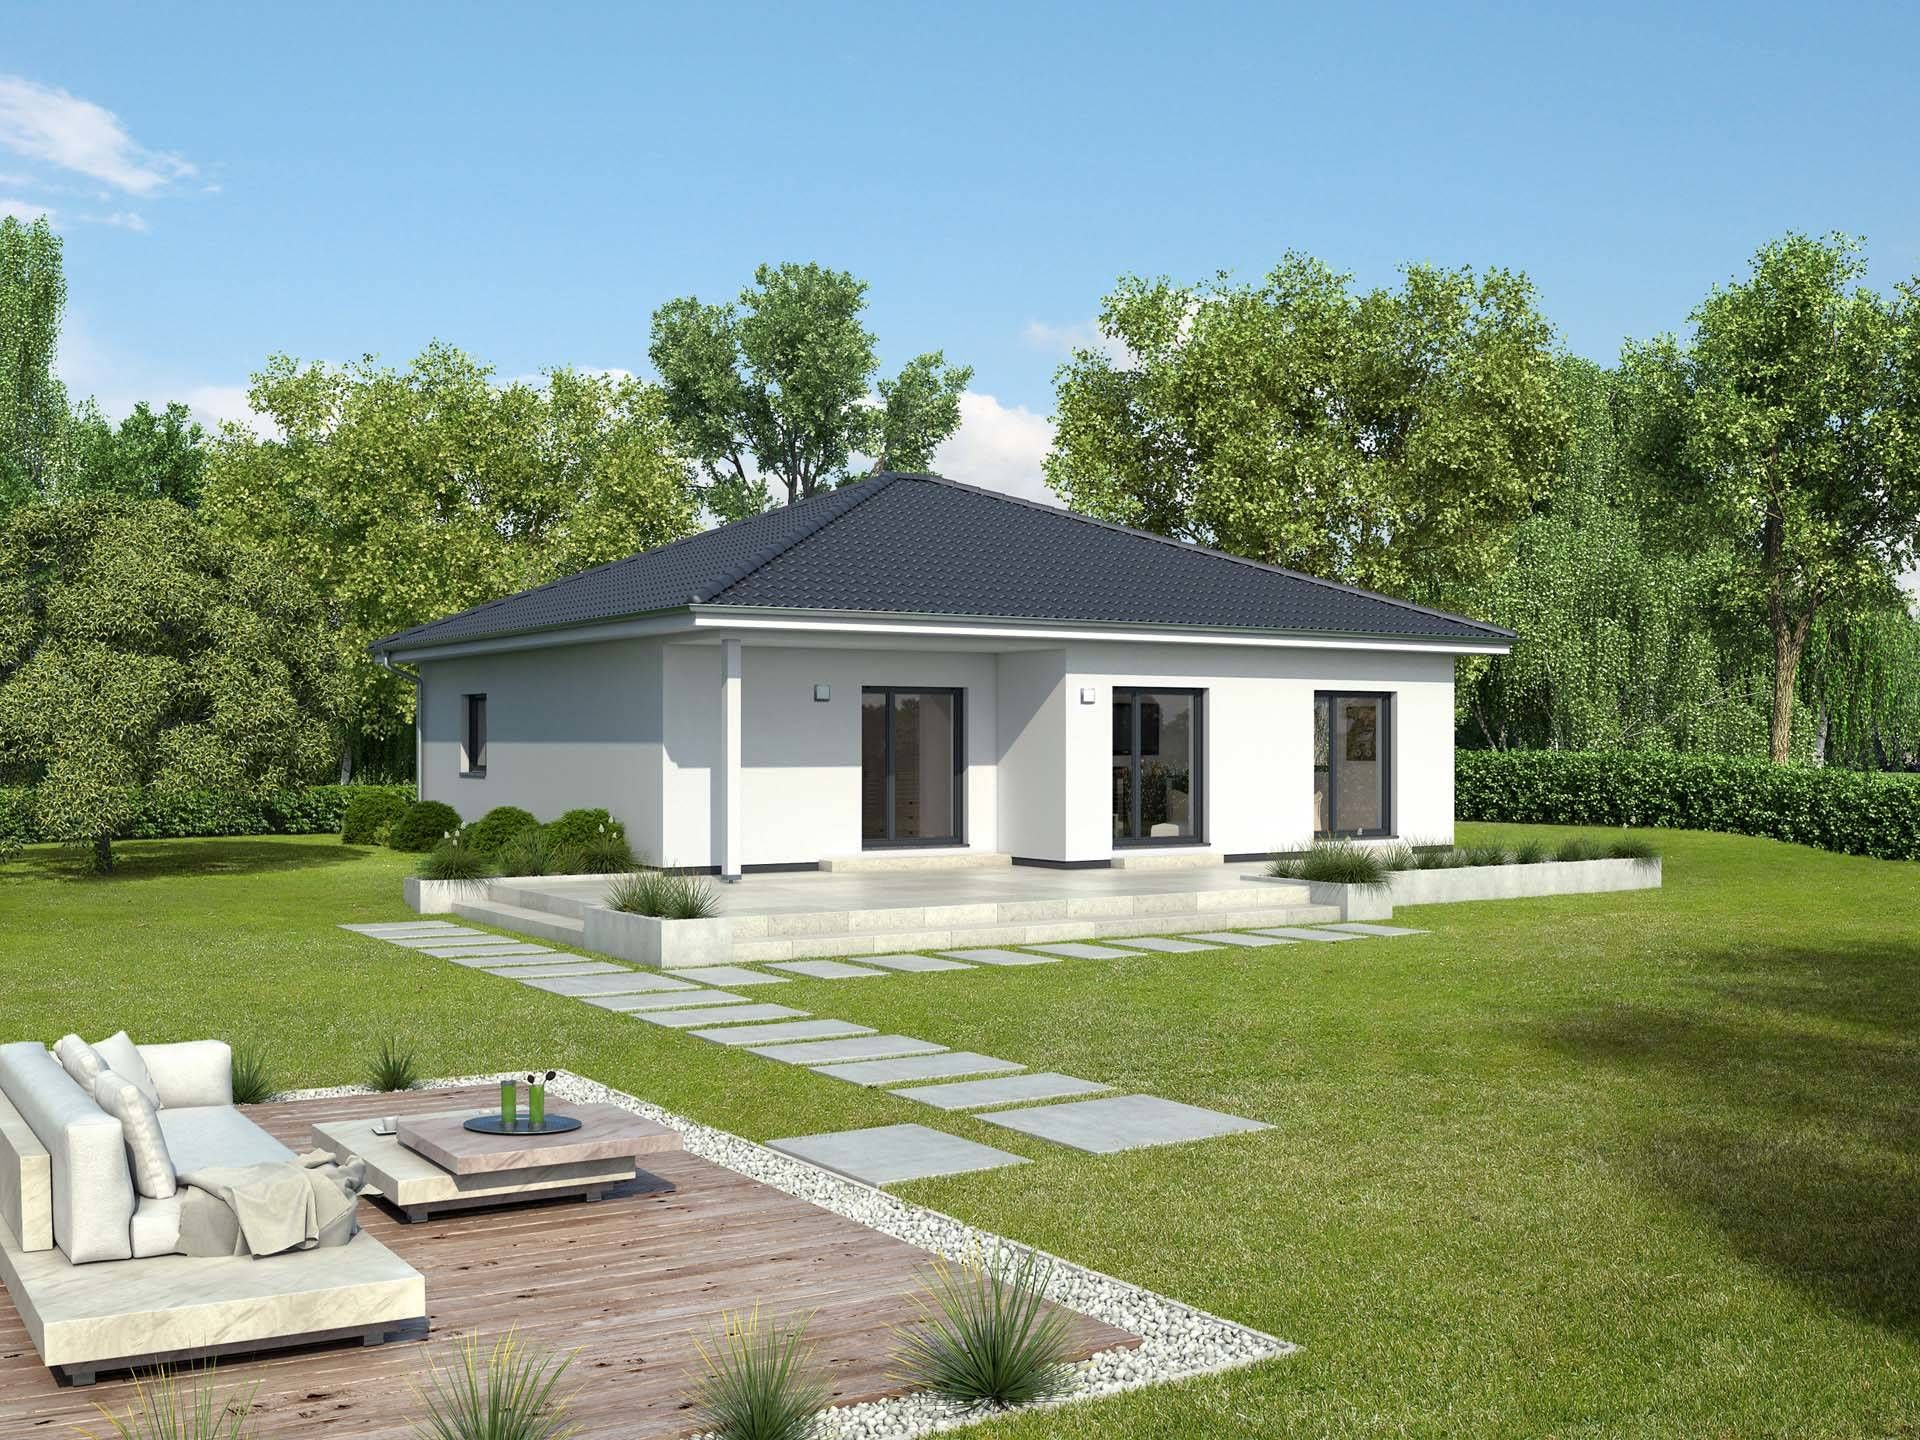 Singlehaus Preis bungalow bordeaux singlehaus gussek haus energieeffizientes